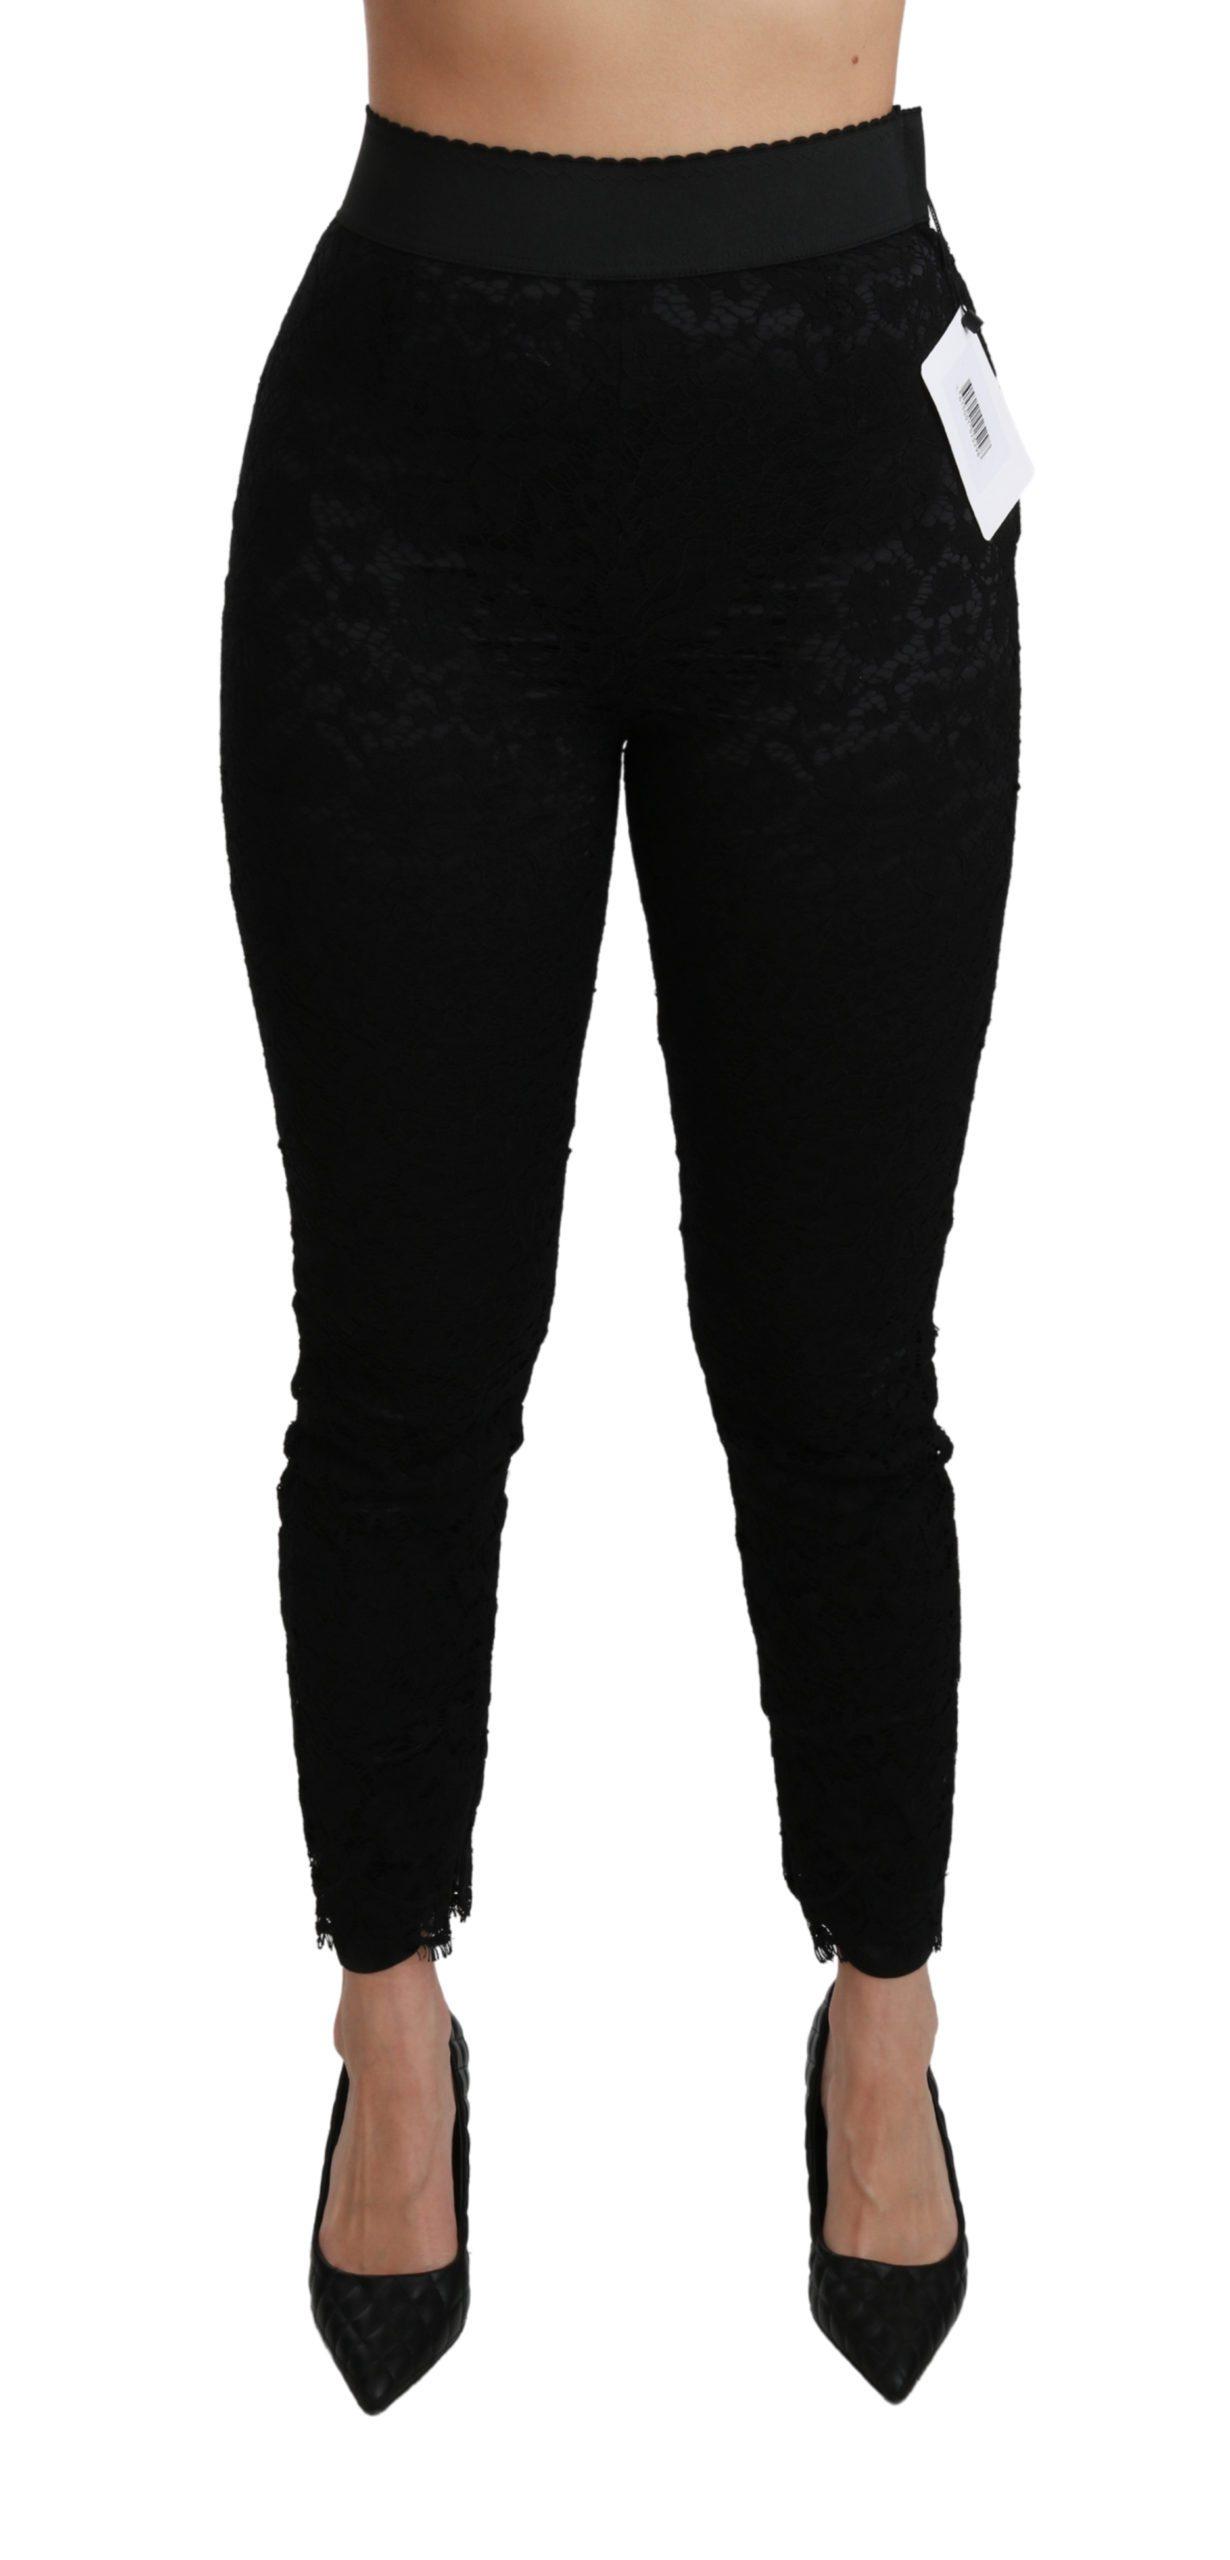 Dolce & Gabbana Women's Skinny High Waist Cotton Trouser Black PAN70895 - IT38|XS